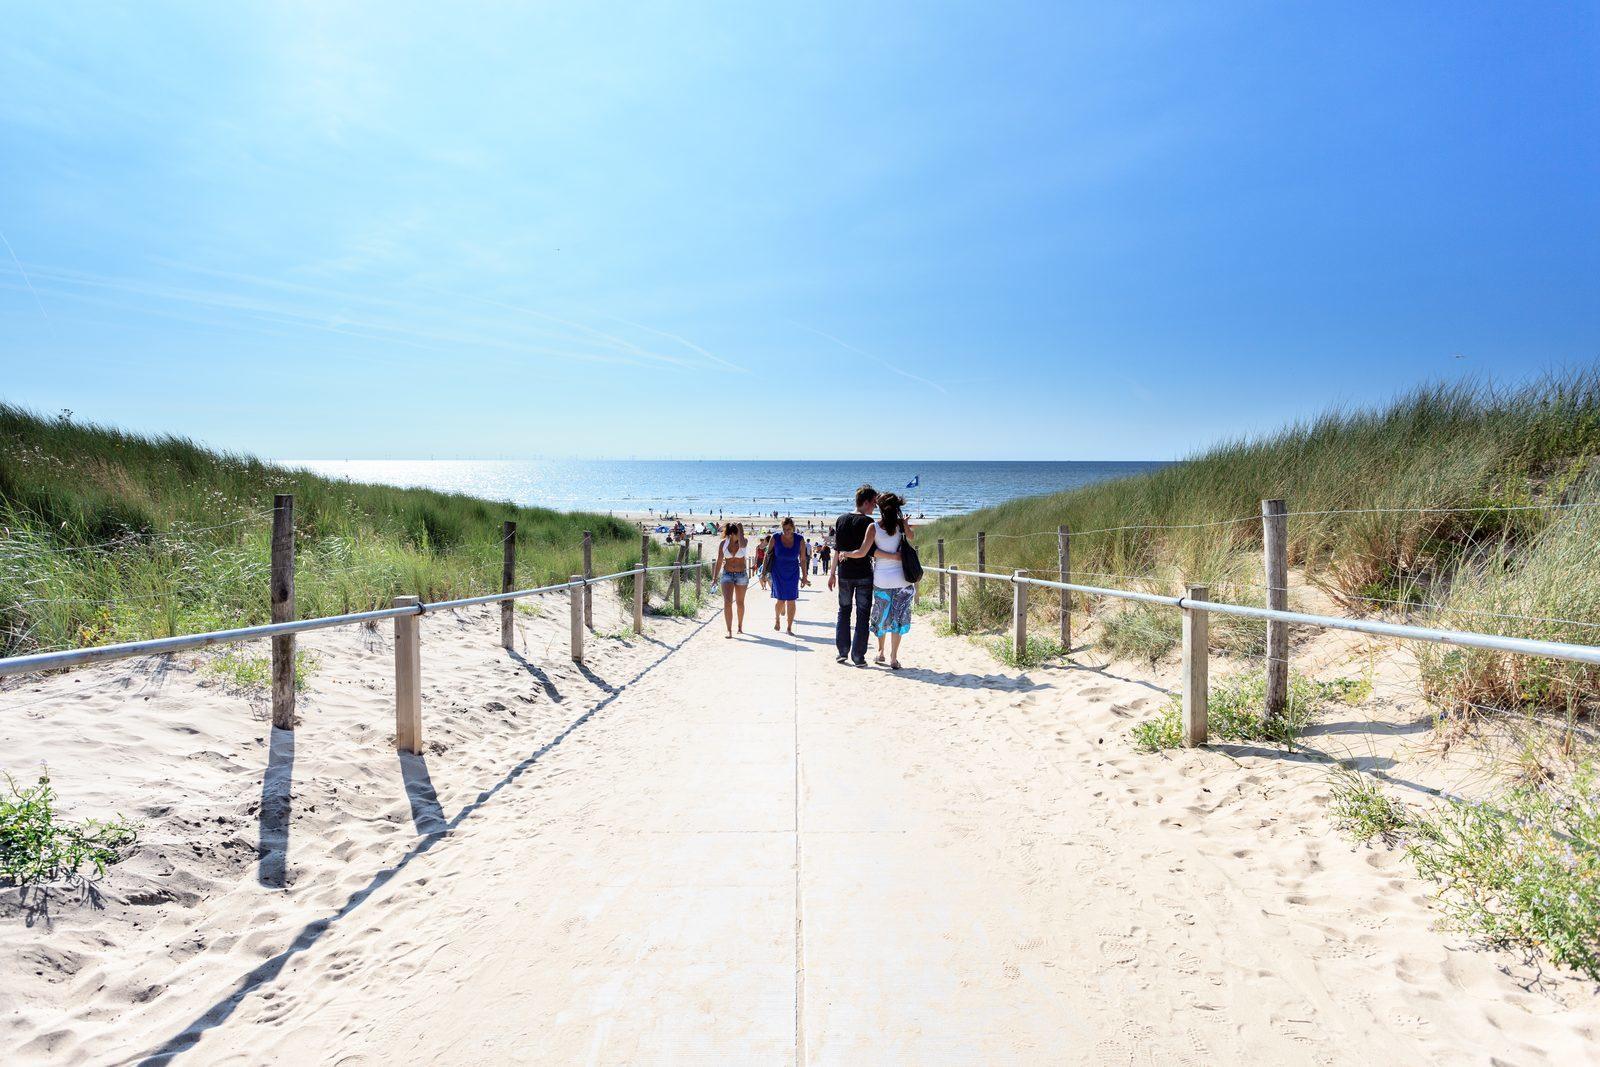 Holiday parks at the coast